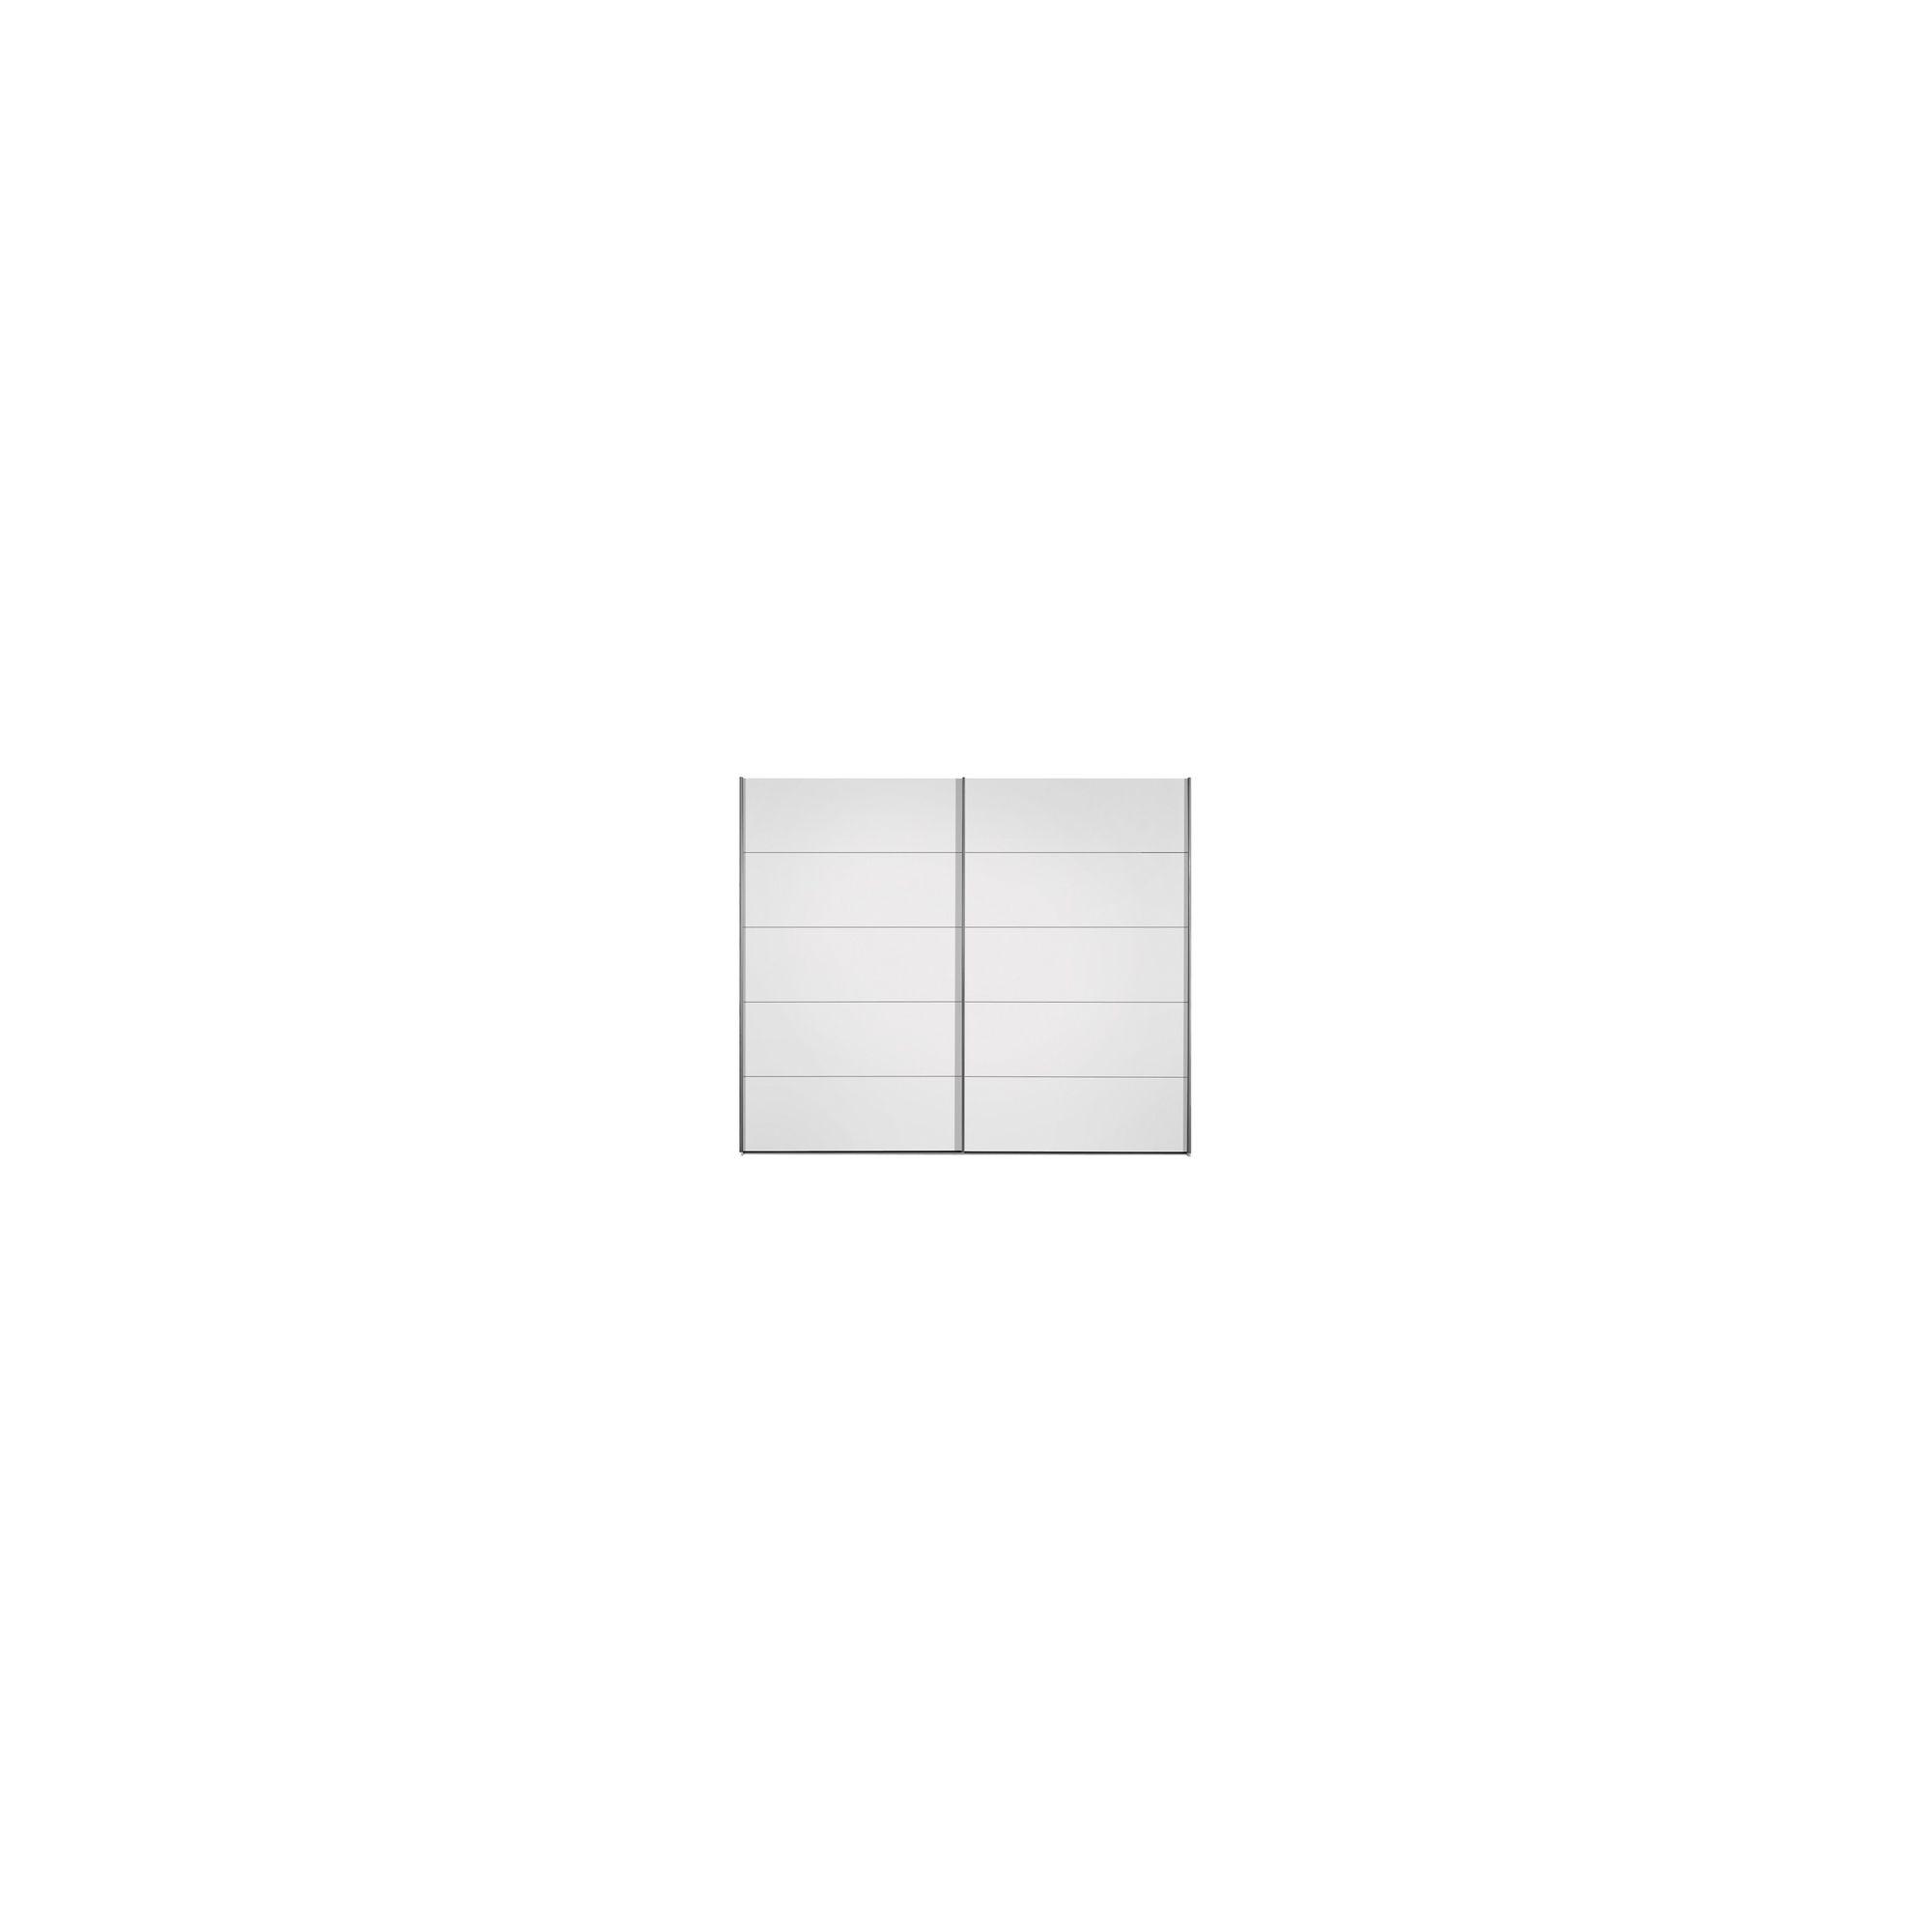 Arte-M Inline Sliding Door Wardrobe - 252cm - White at Tesco Direct